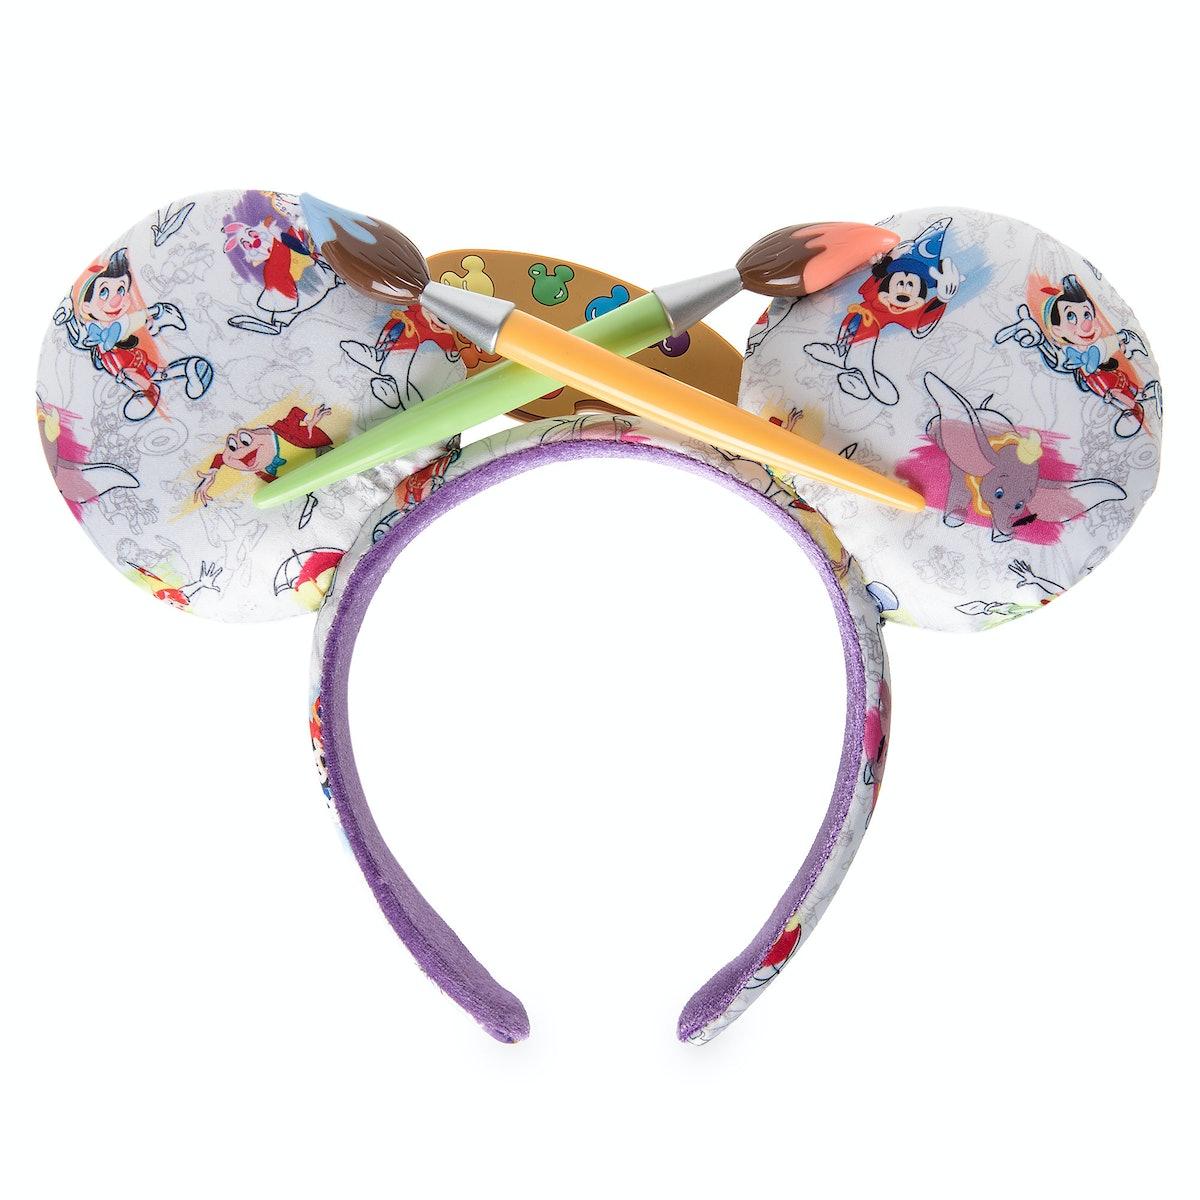 Disney Ink & Paint Ear Headband for Adults